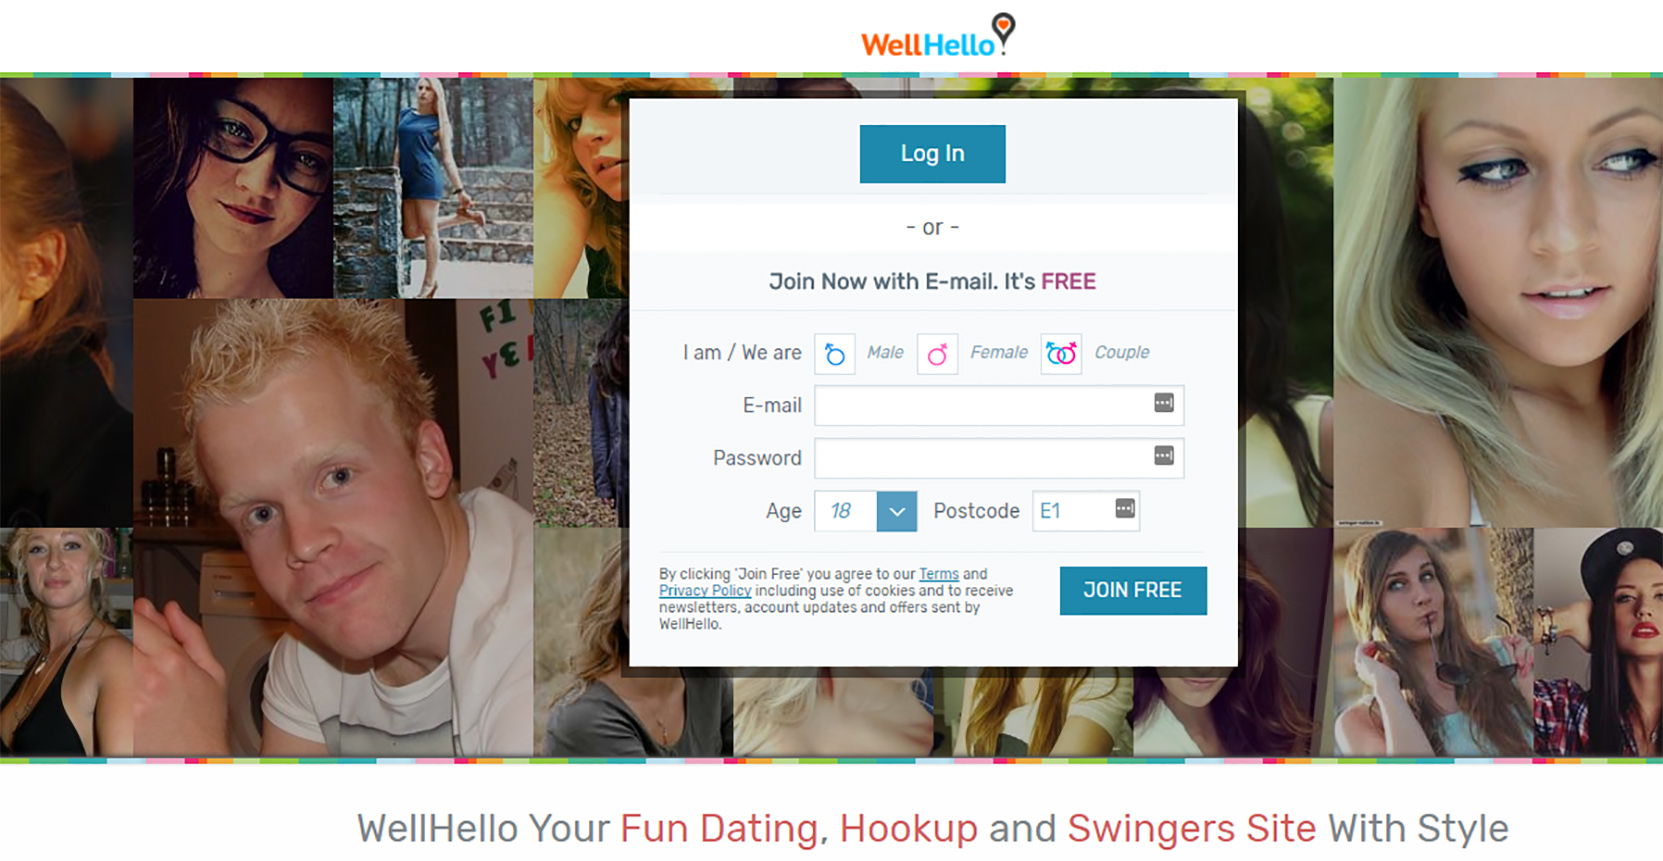 WellHello Signup